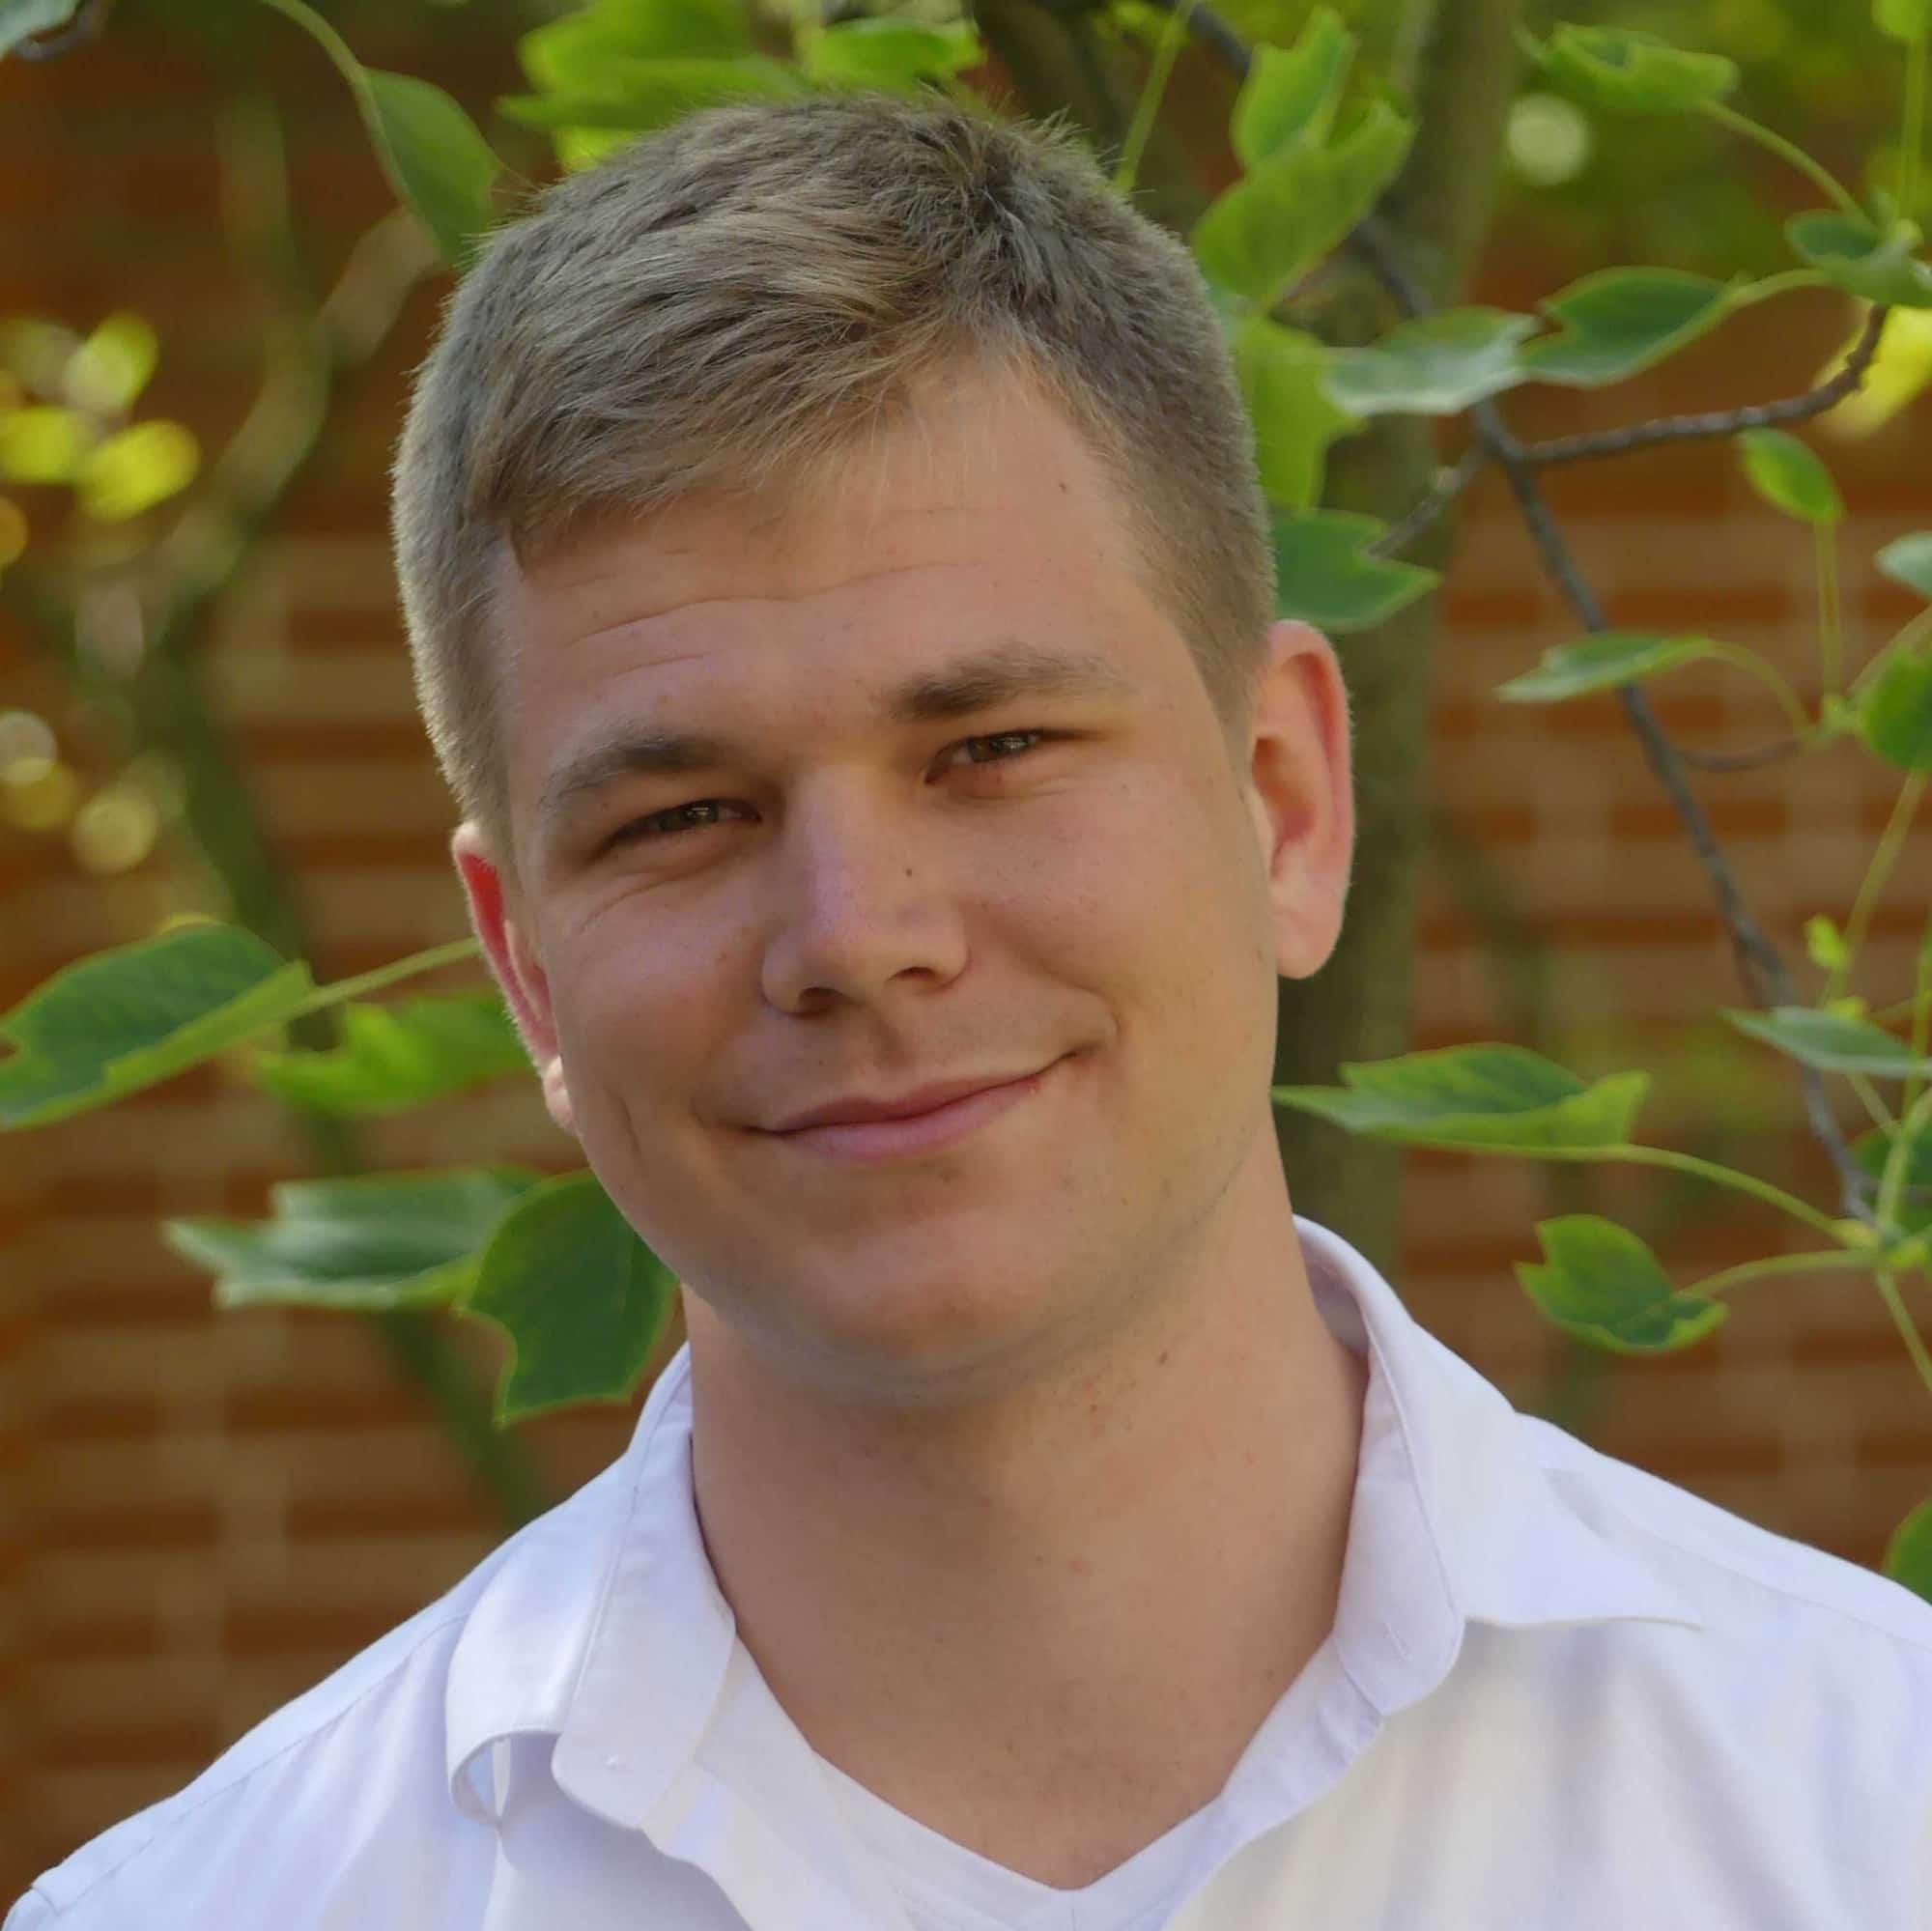 Customer Voices: Dennis Kwiatkowski, PhD Student at Charité, Berlin